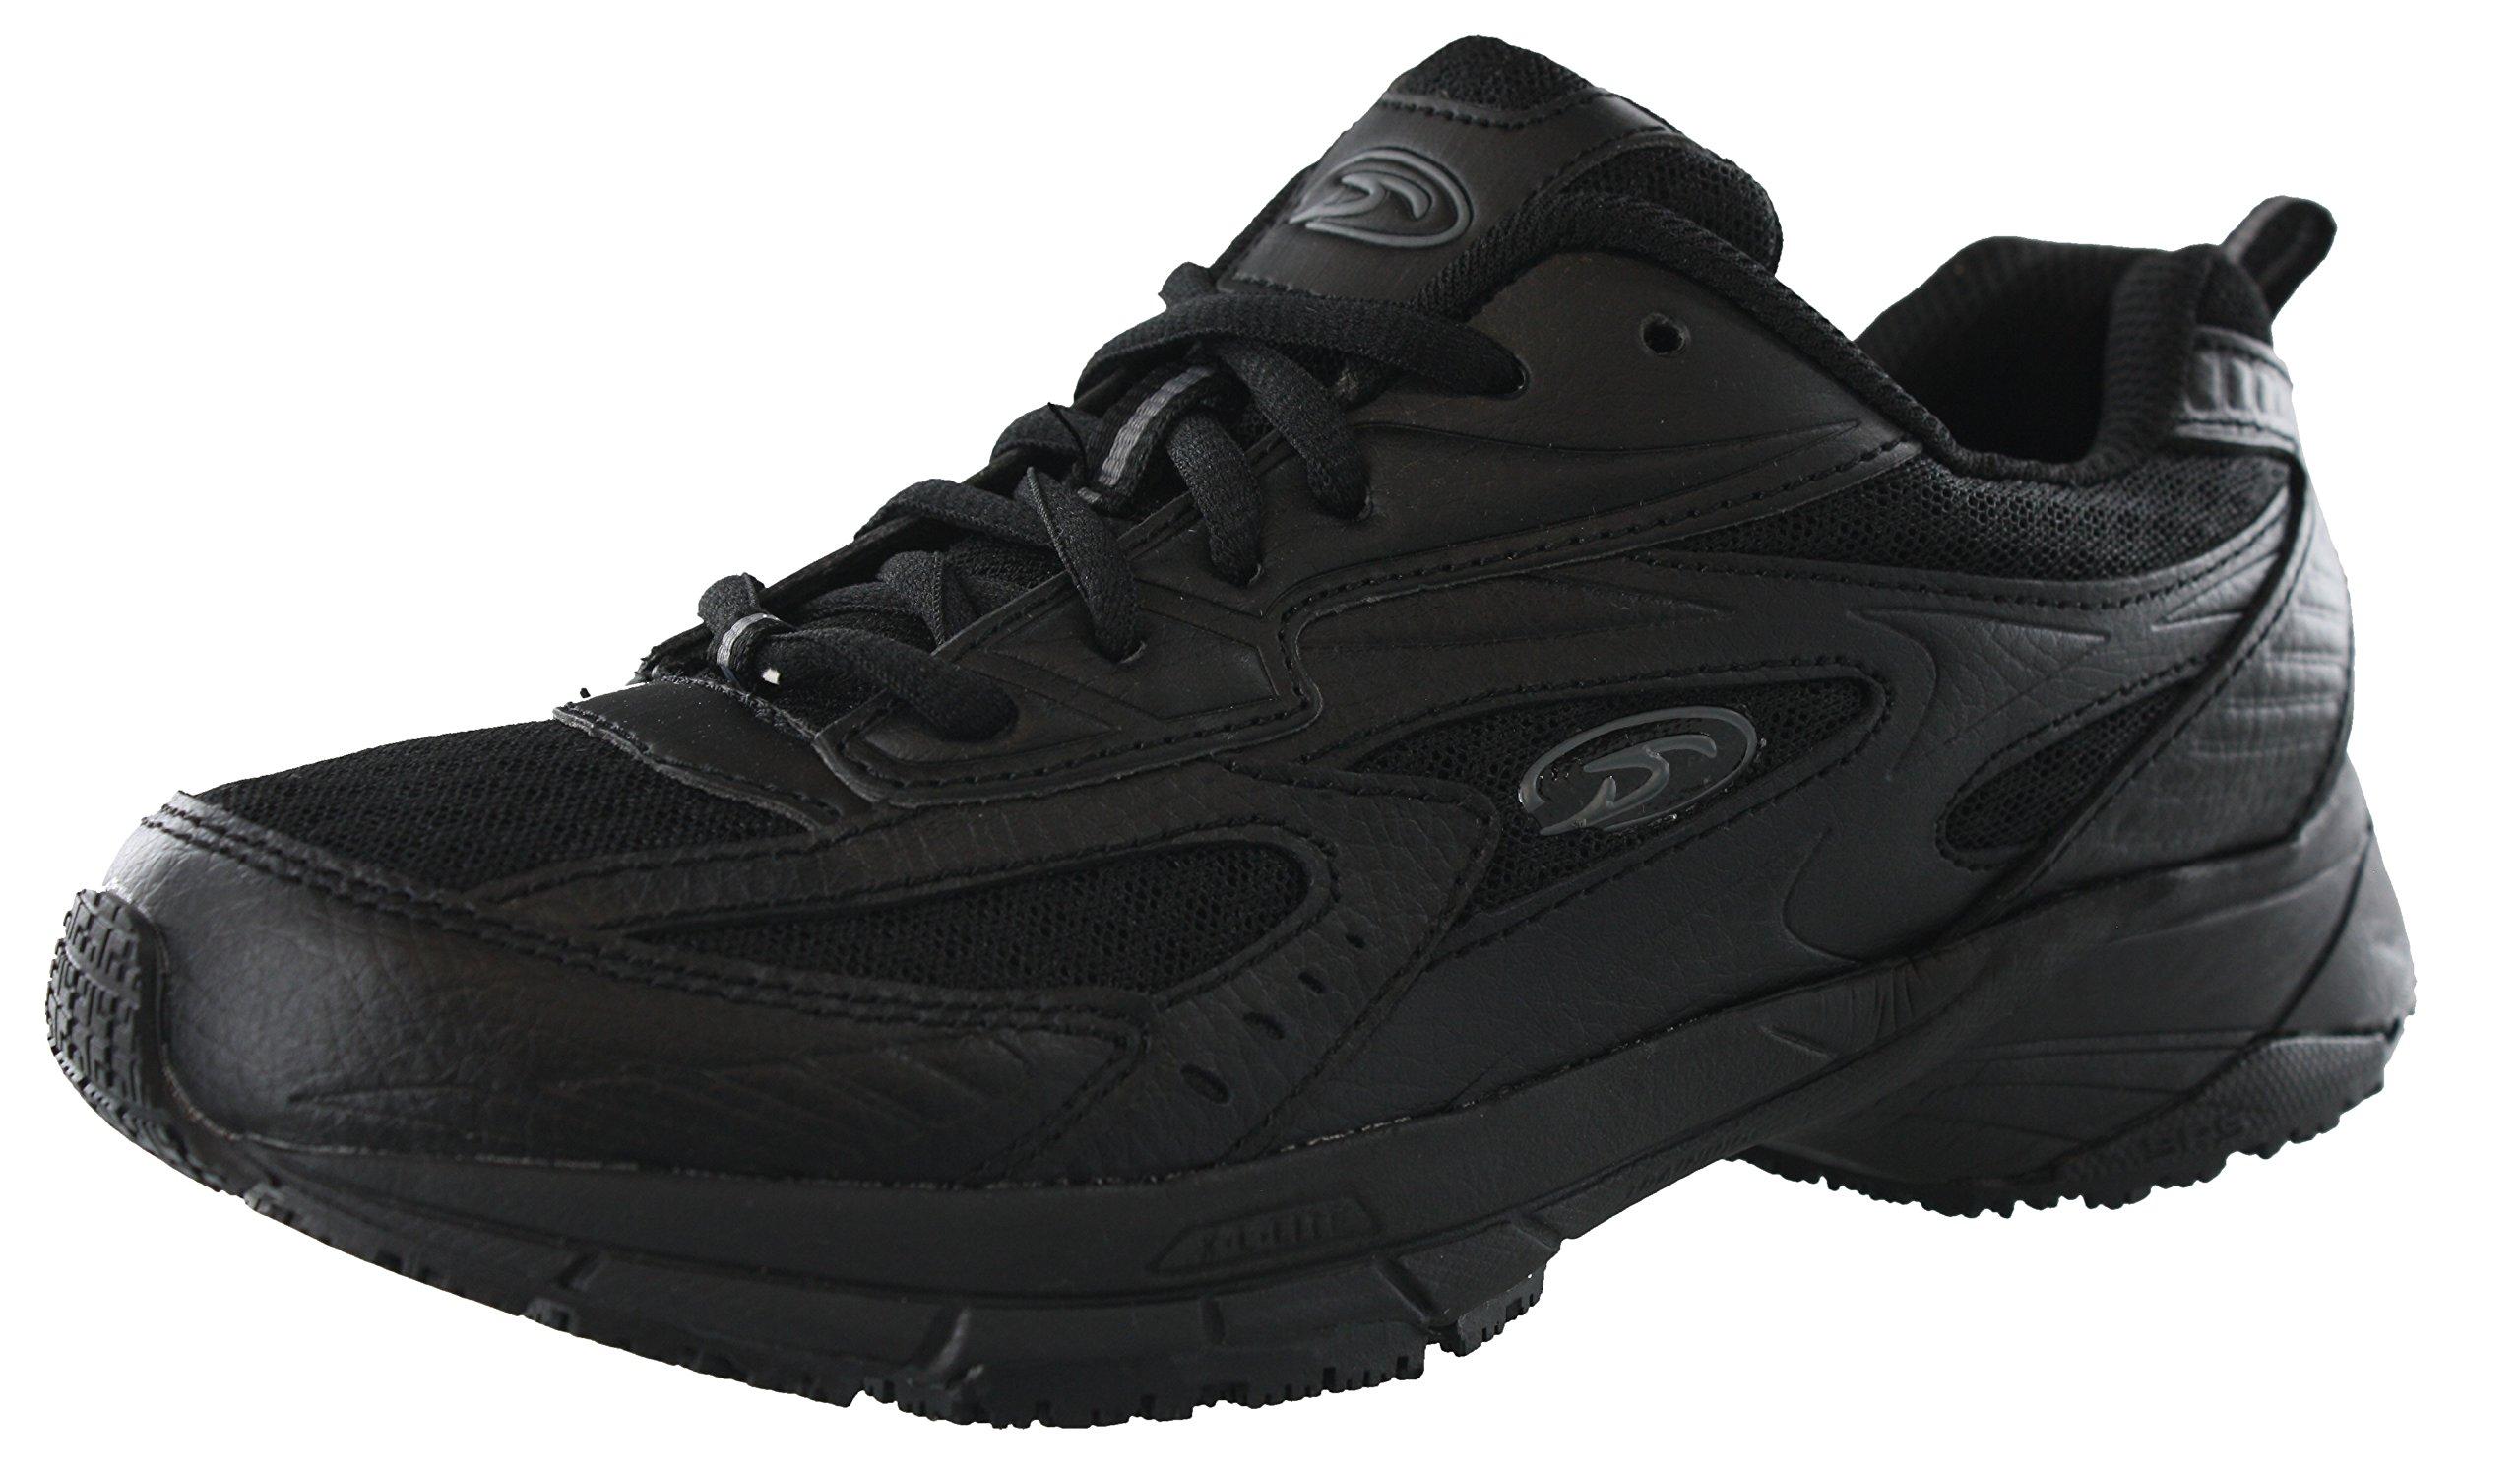 Dr. Scholl's Women's Peppy Black Wide Width Uniform Work Shoes (7 Wide US) by Dr. Scholl's